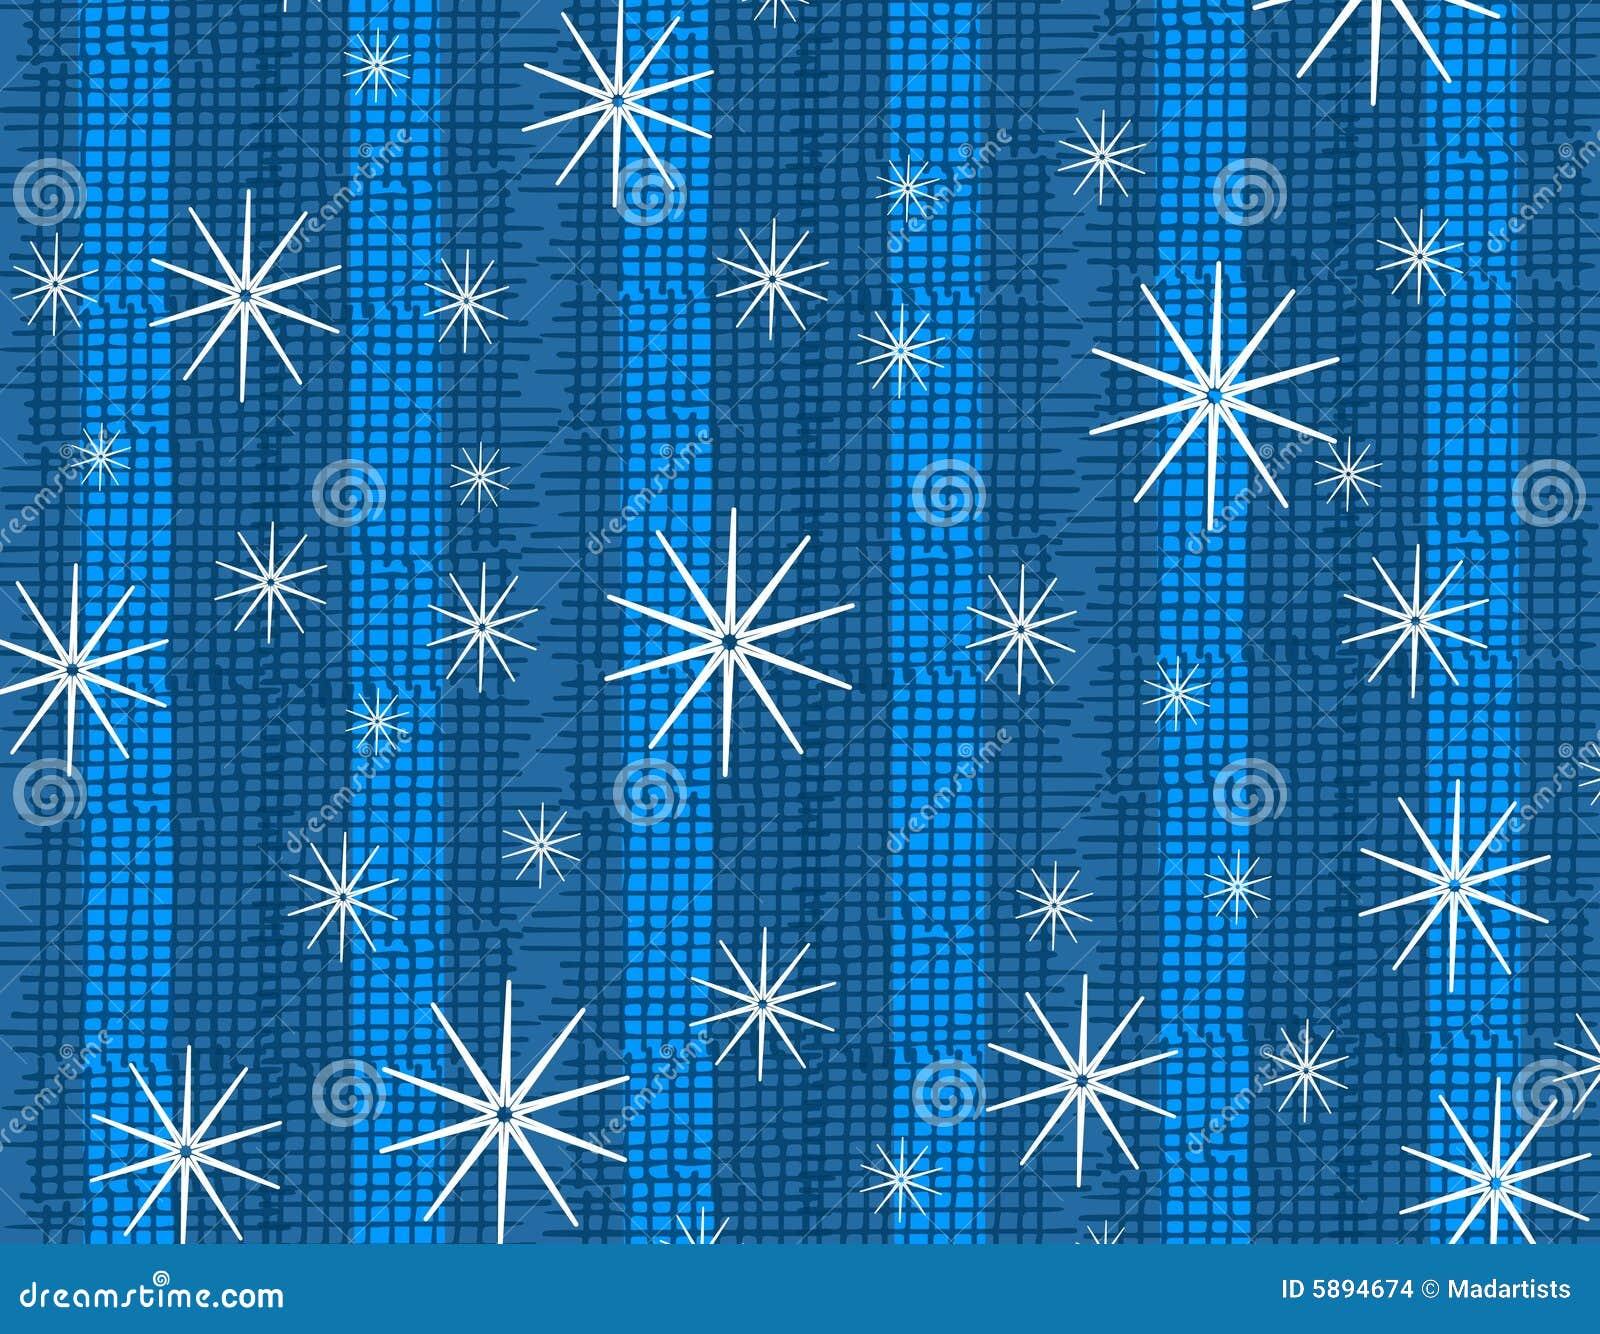 rustic snowflake texture stock illustration illustration of